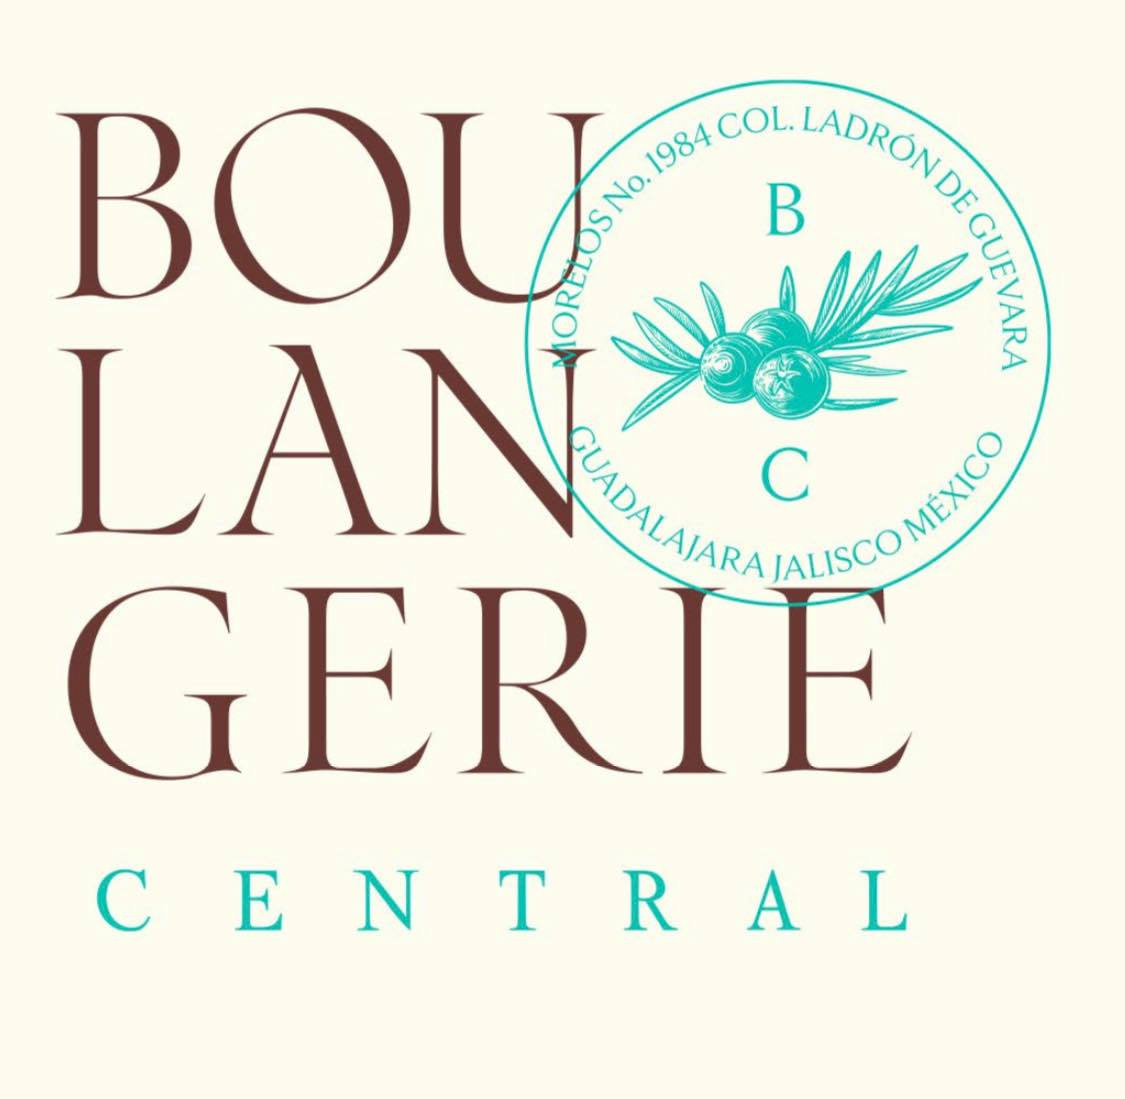 BOULANGERIE CENTRAL